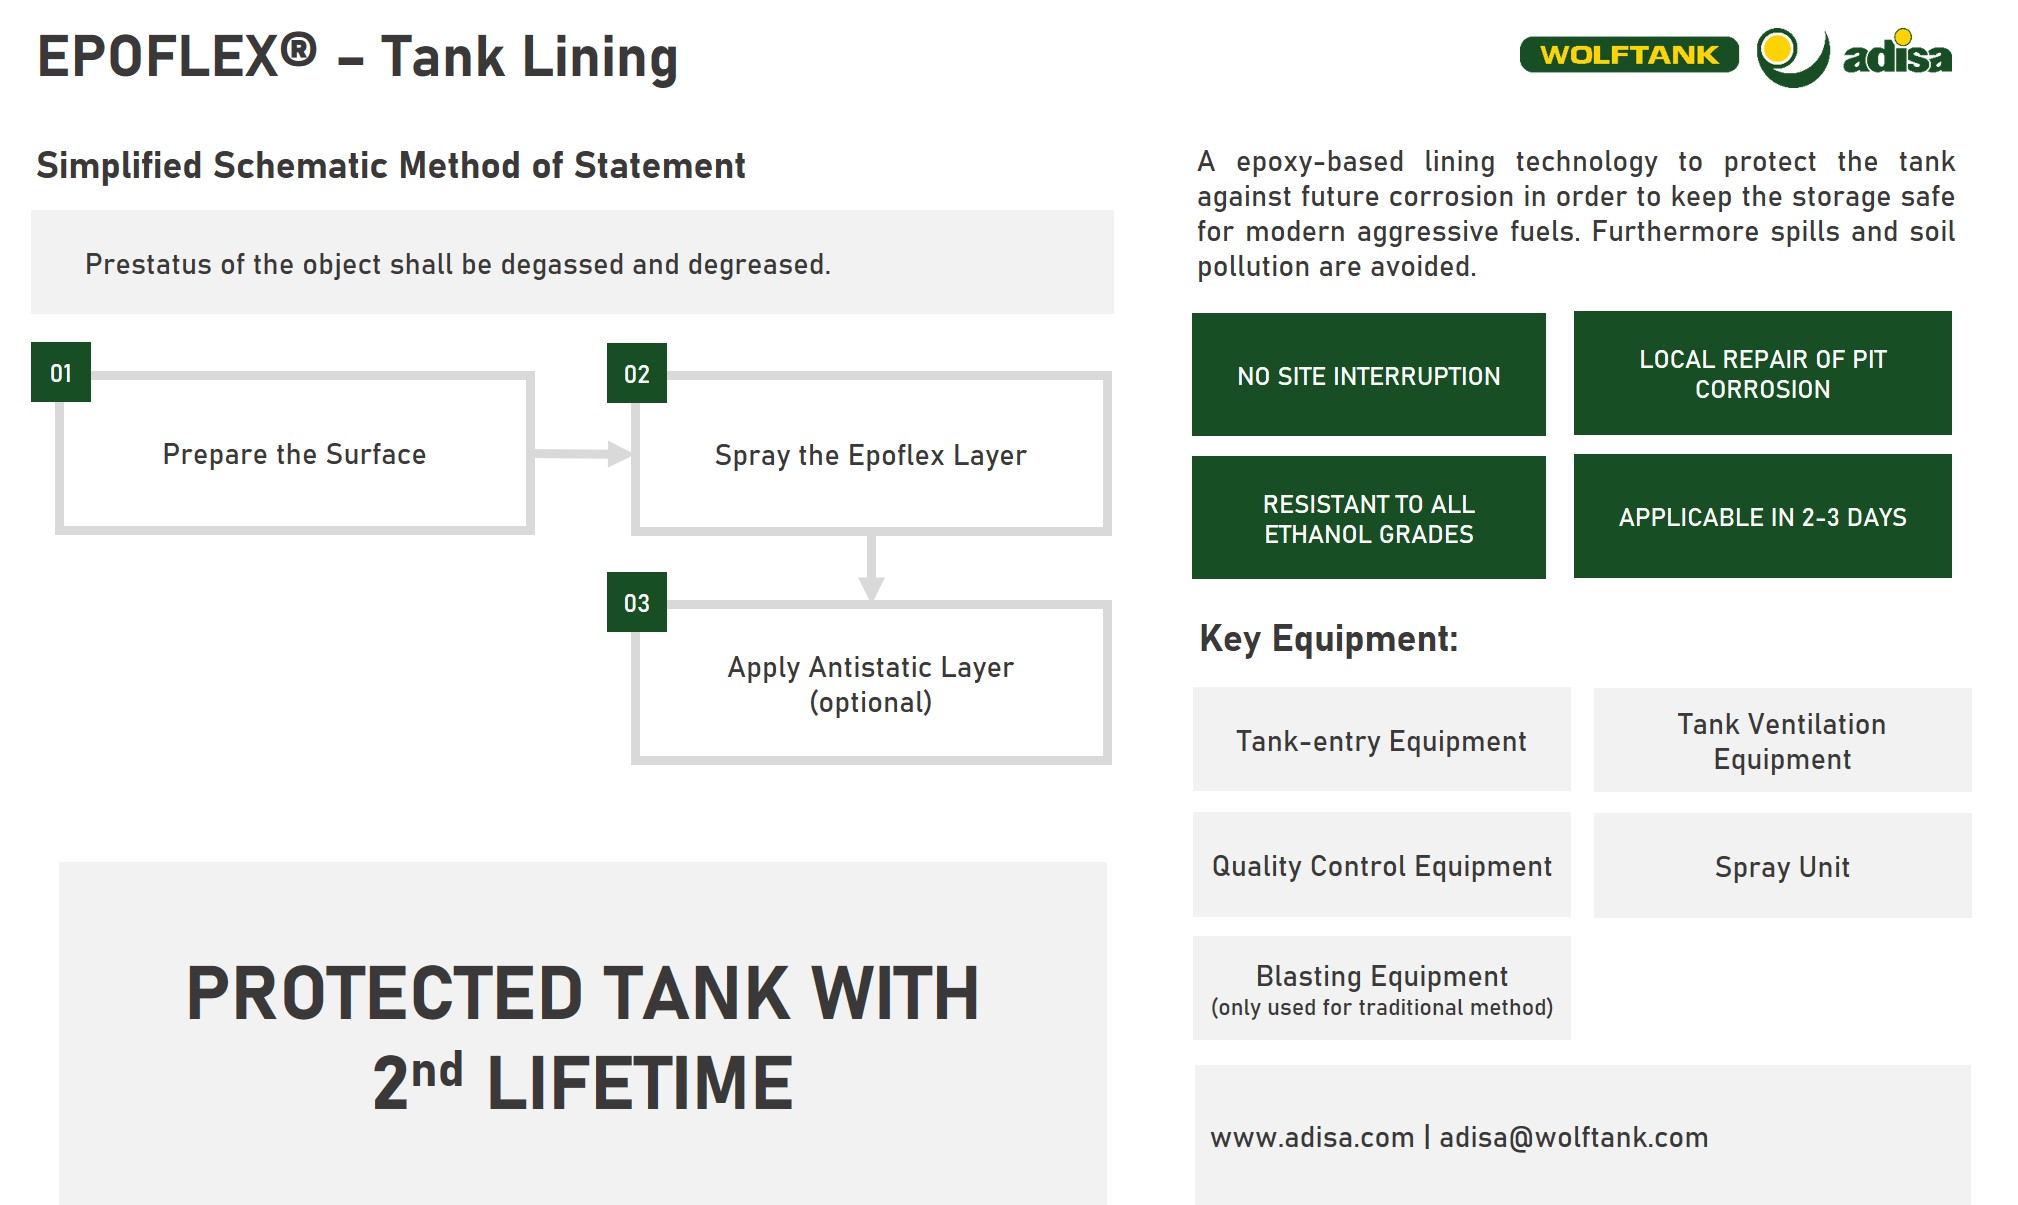 EPOFLEX Tank Lining Simple Method Statement - Wolftank Adisa